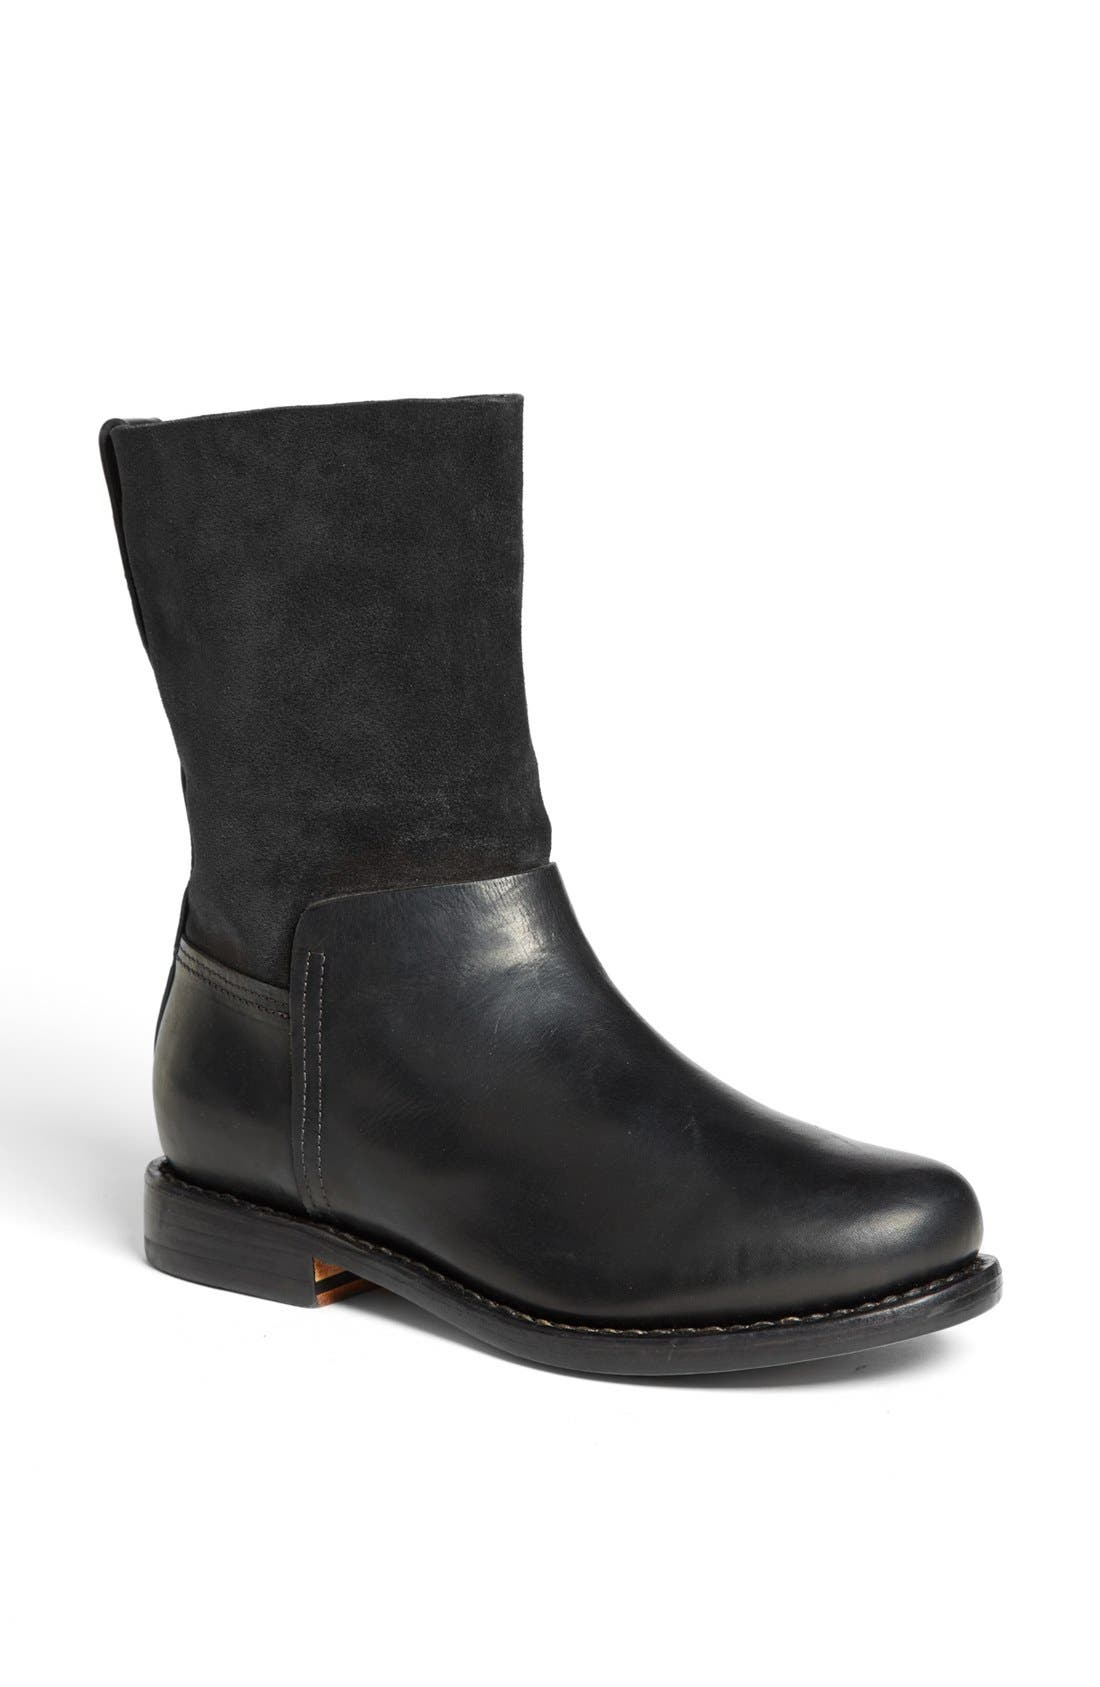 Alternate Image 1 Selected - rag & bone 'Highland' Boot